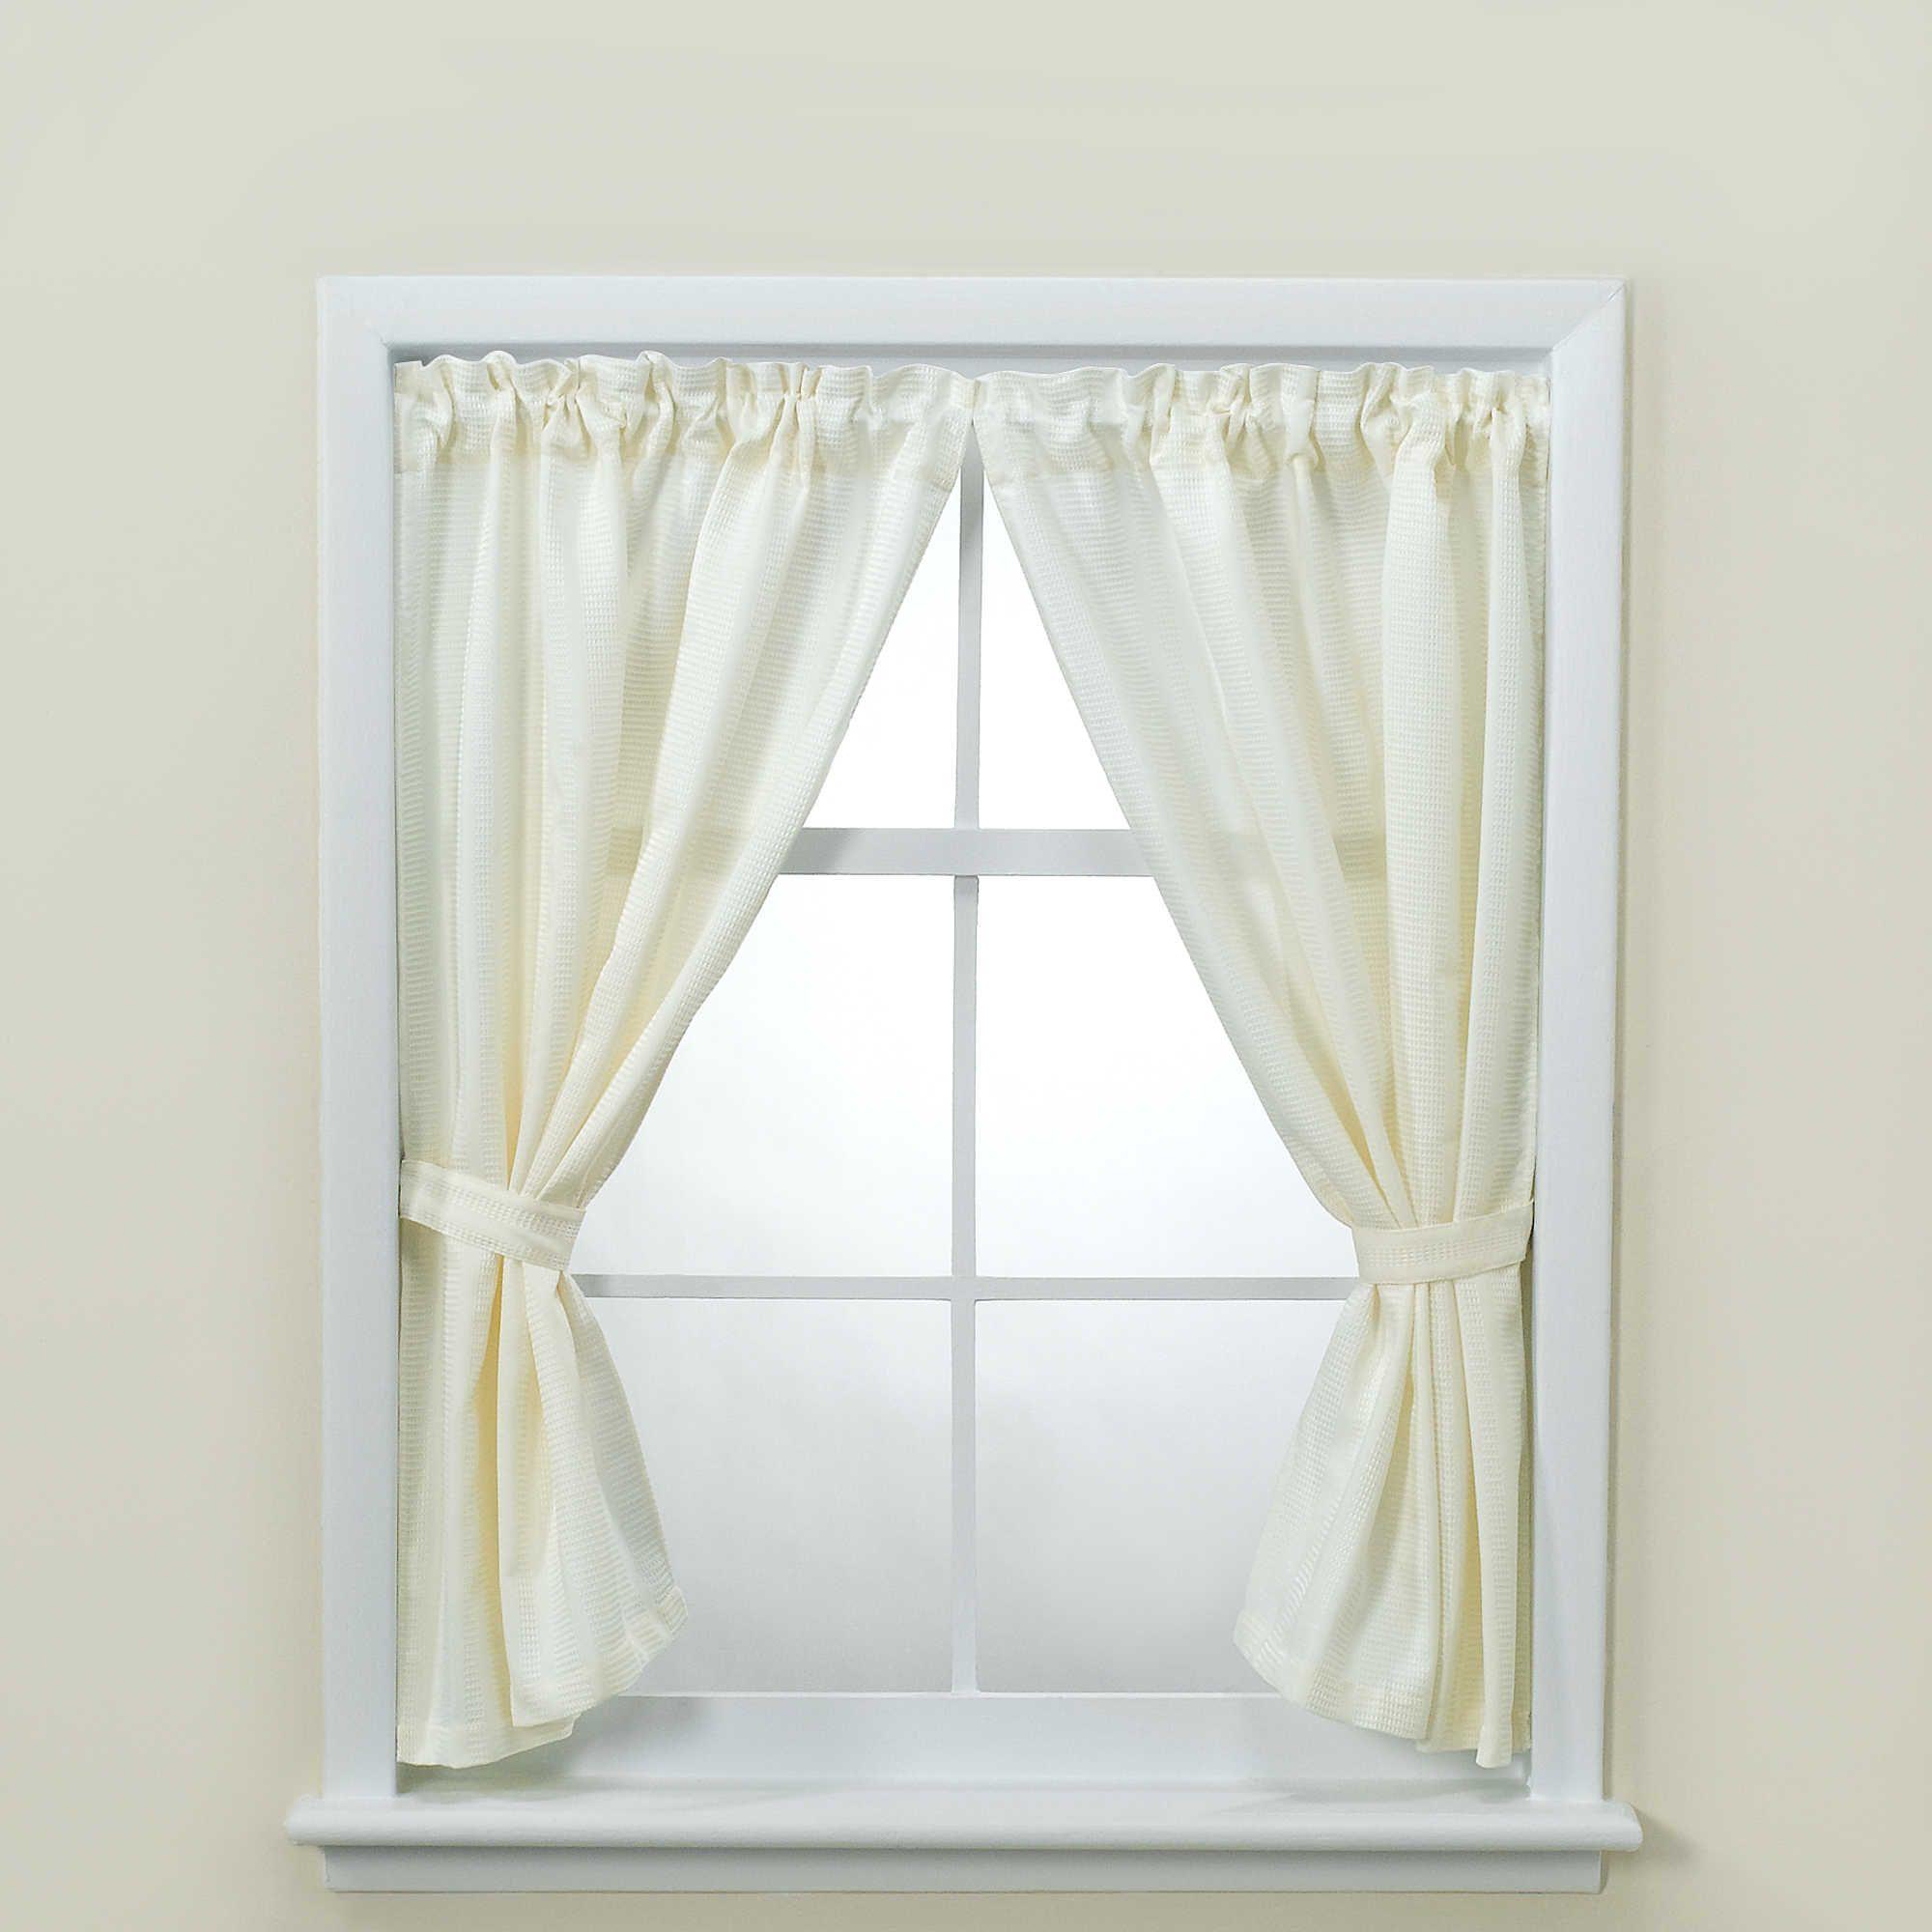 Westerly Bathroom Window Curtain Pair With Tiebacks And Hooks